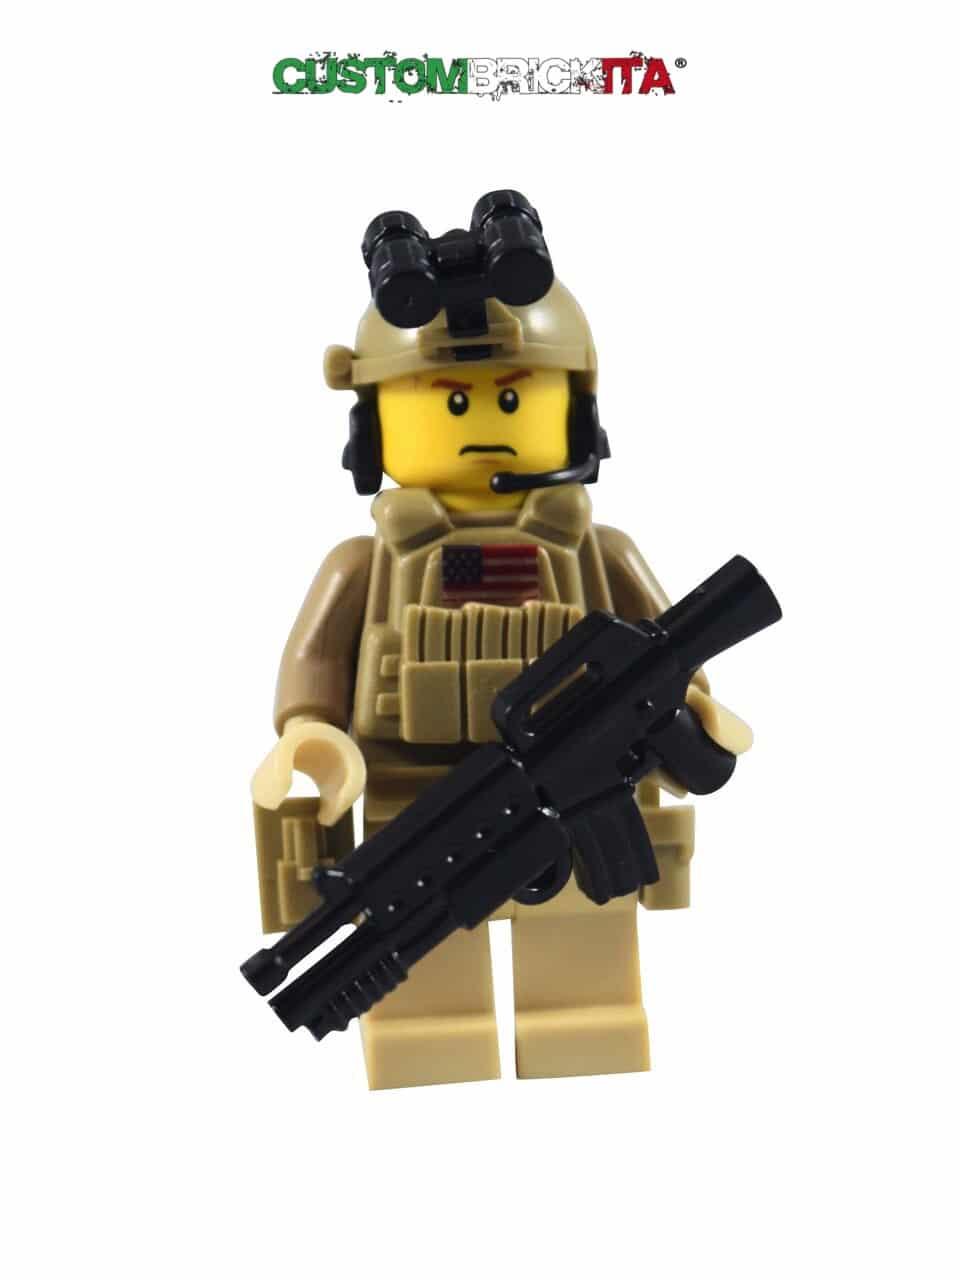 Lego Custom Minifigures